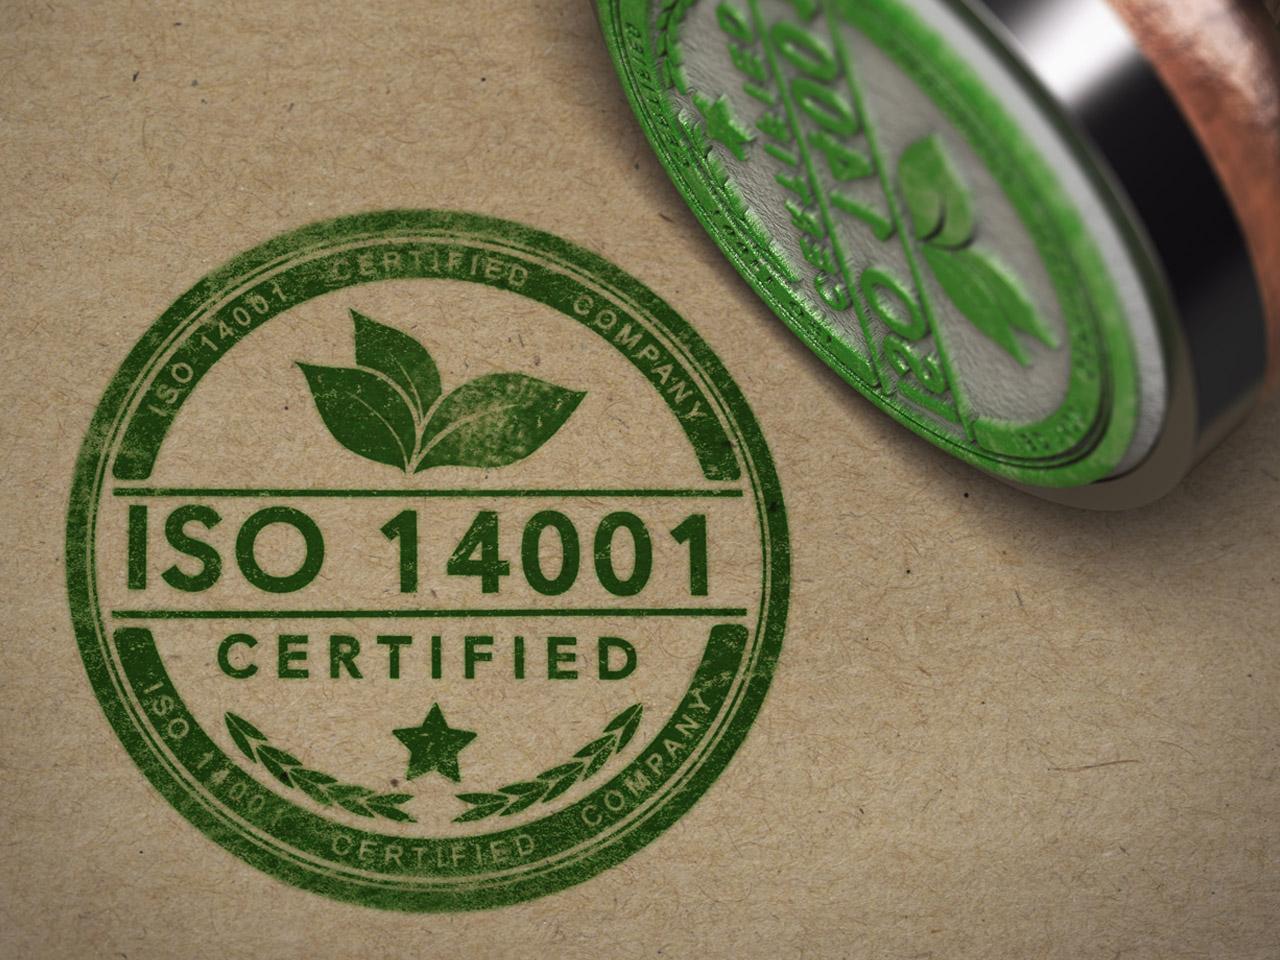 Aplicaciones Tecnológicas adapts and recertifies its Environmental Management System ISO 14001